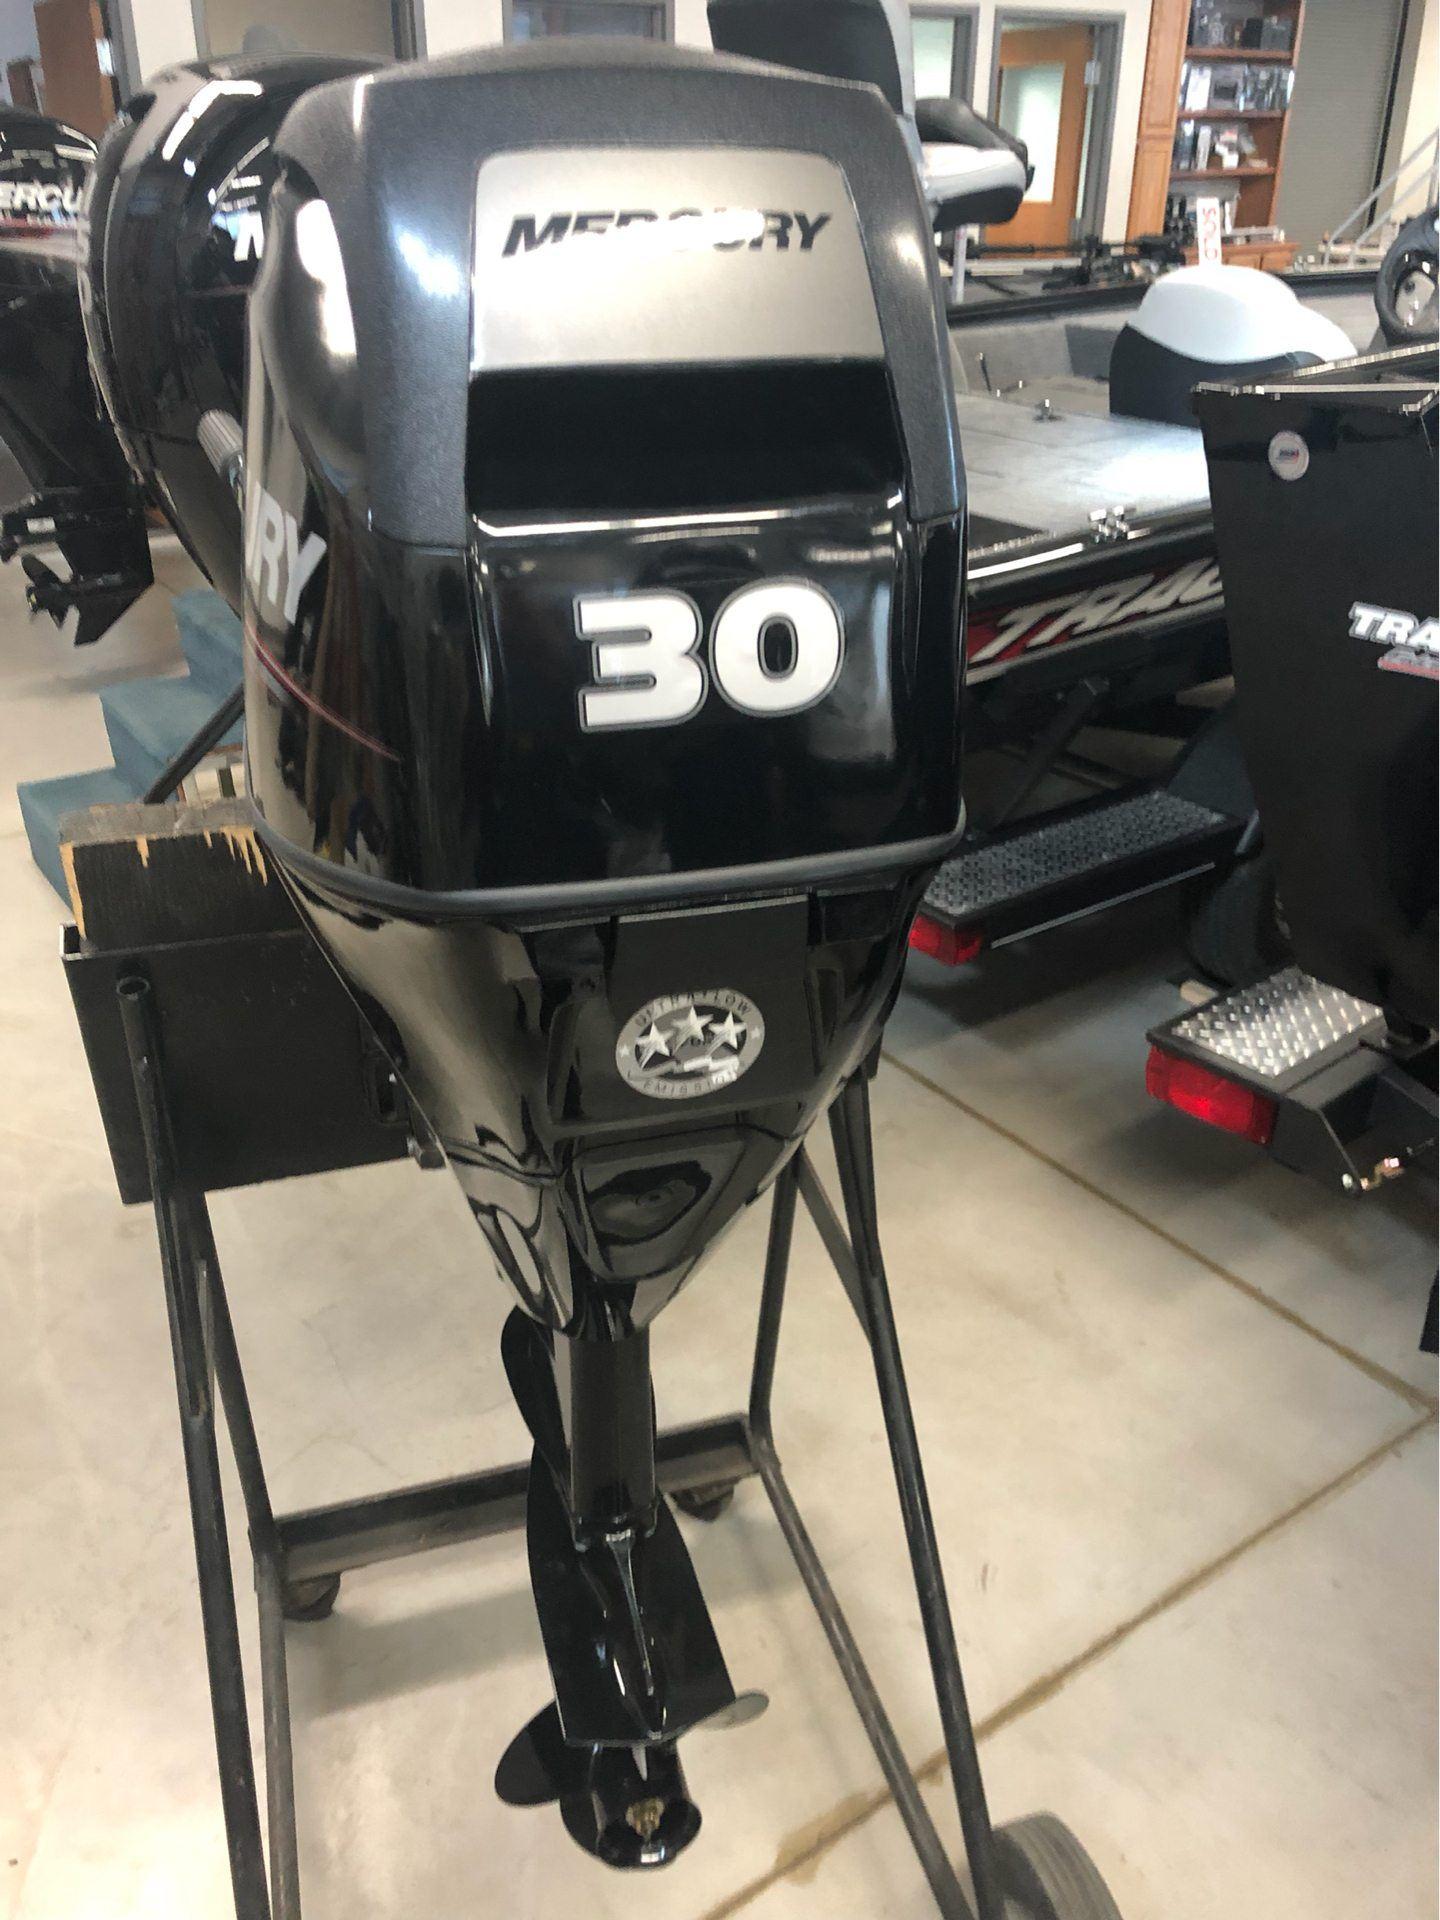 2018 Mercury Marine 30 hp EFI in Appleton, Wisconsin